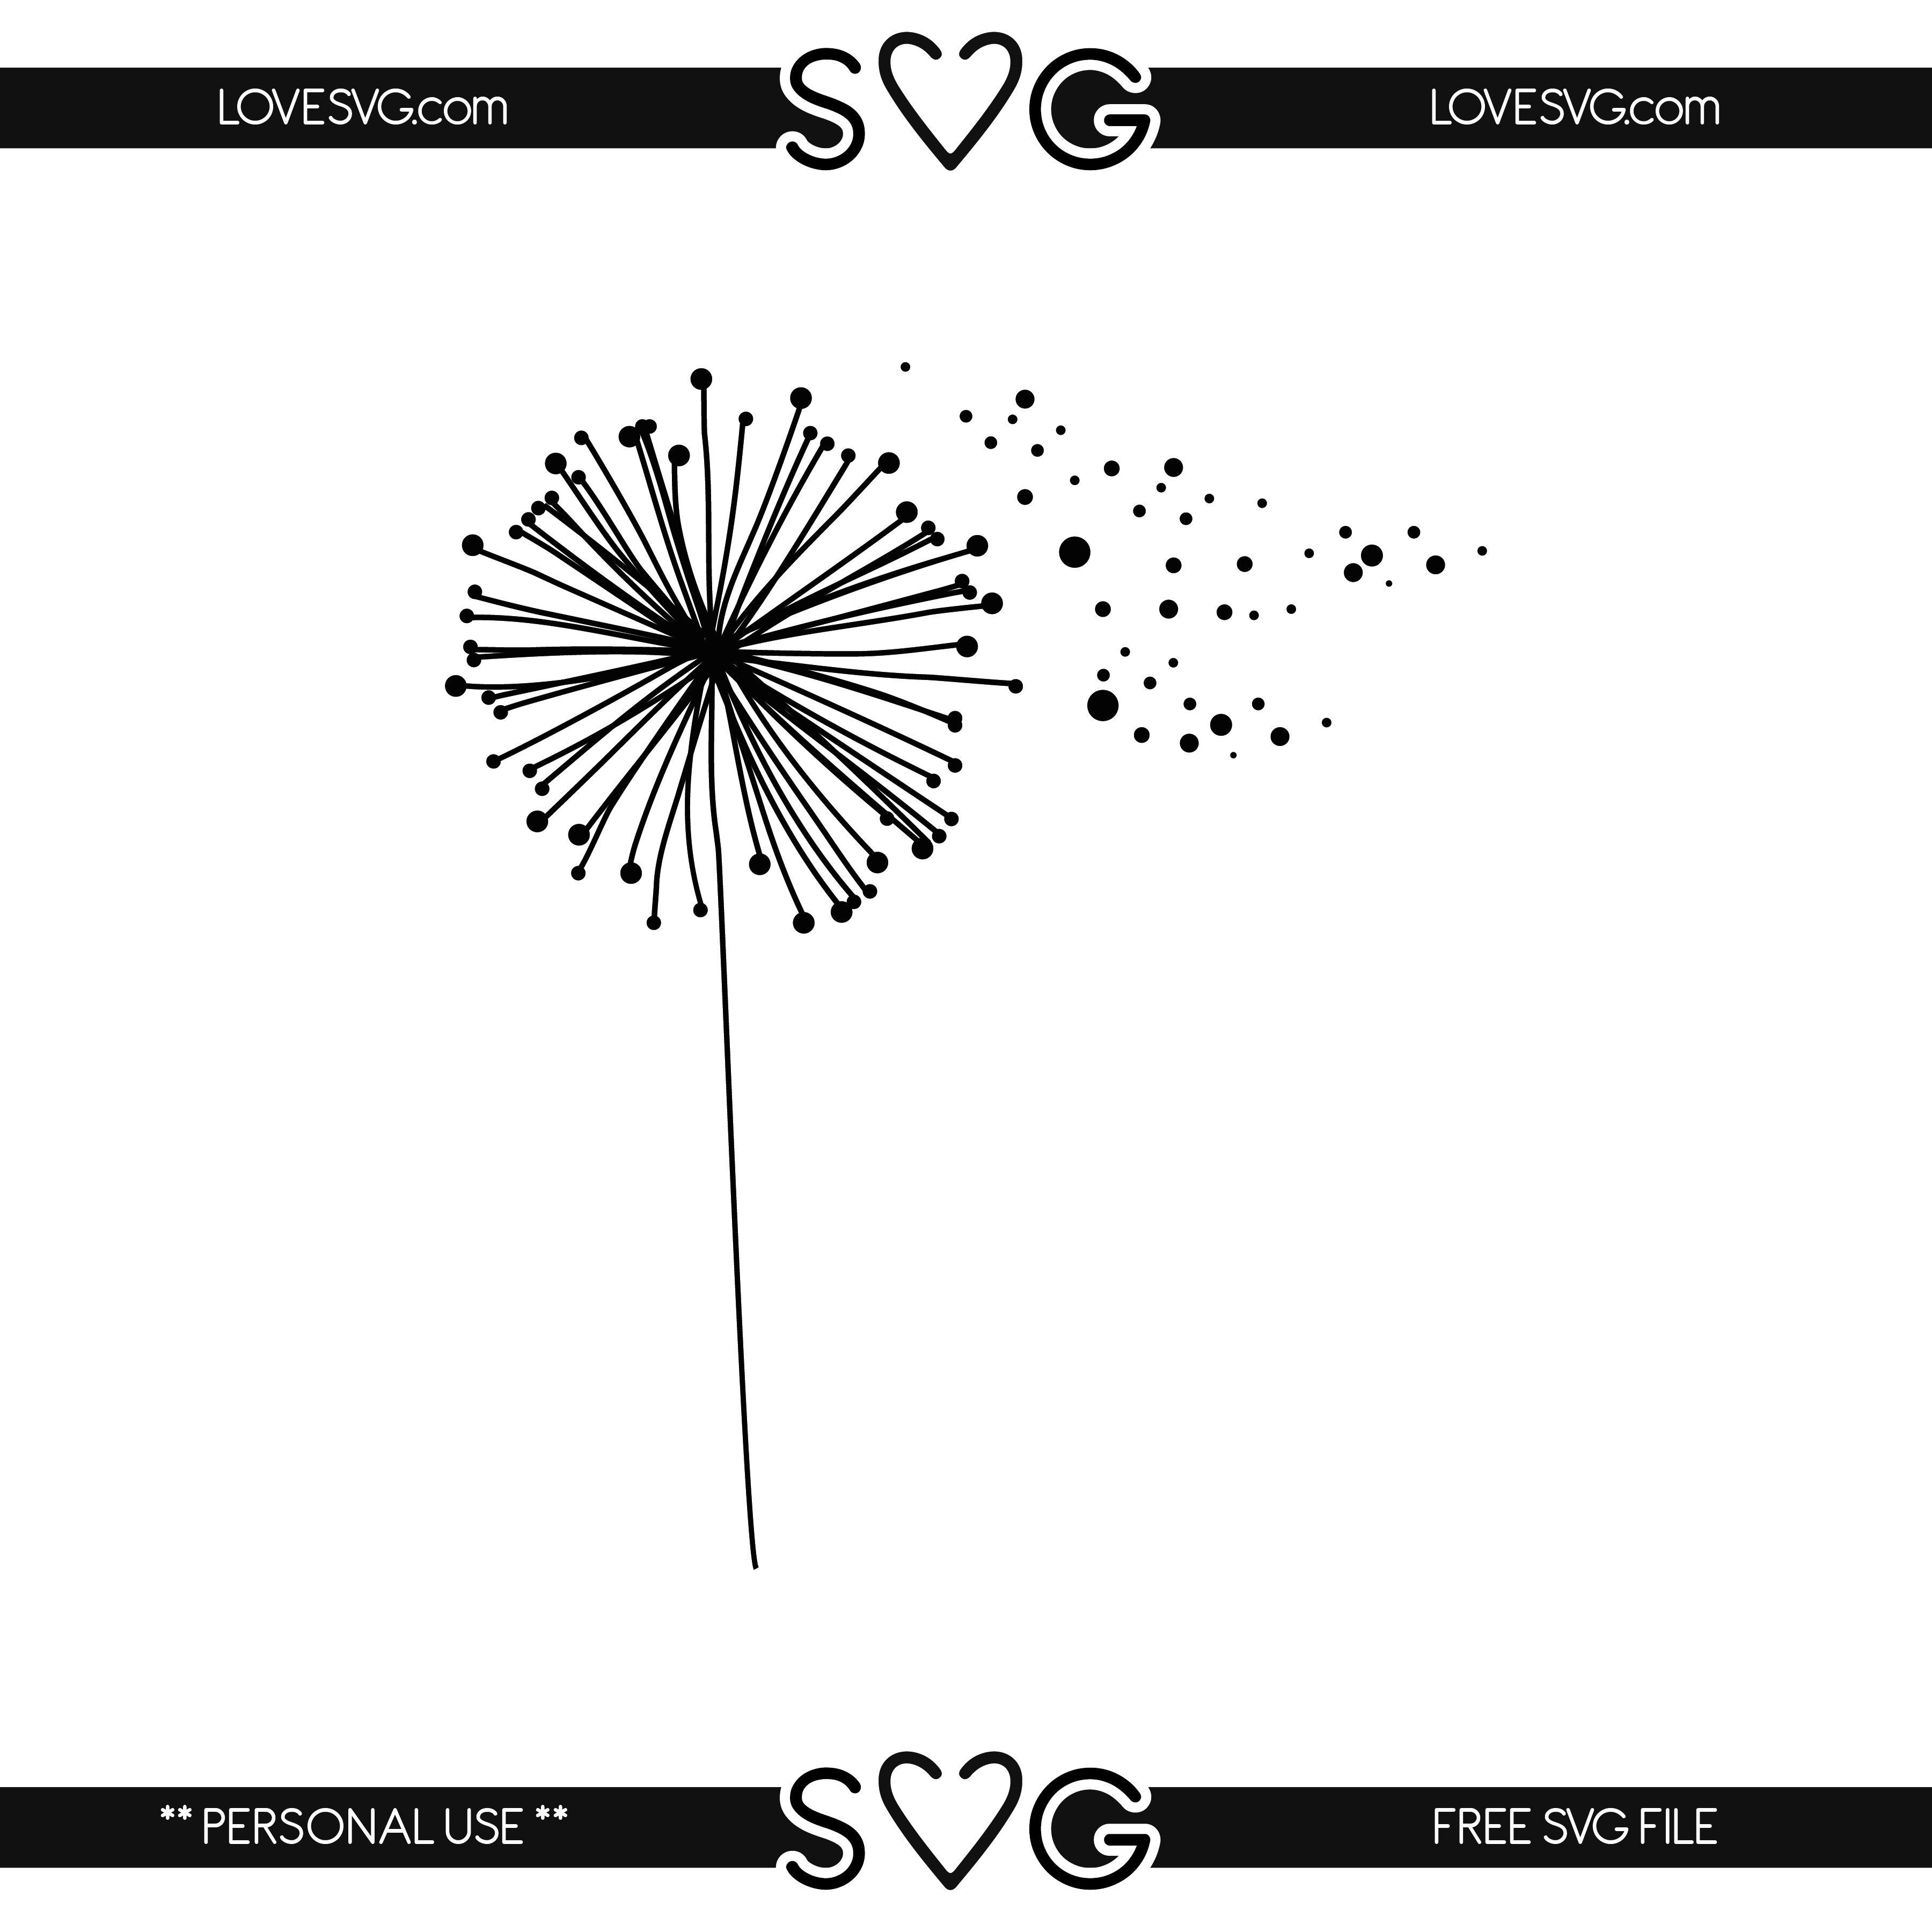 Dandelion Svg 3 Download Drawings Svg Free Files Cricut Free Svg